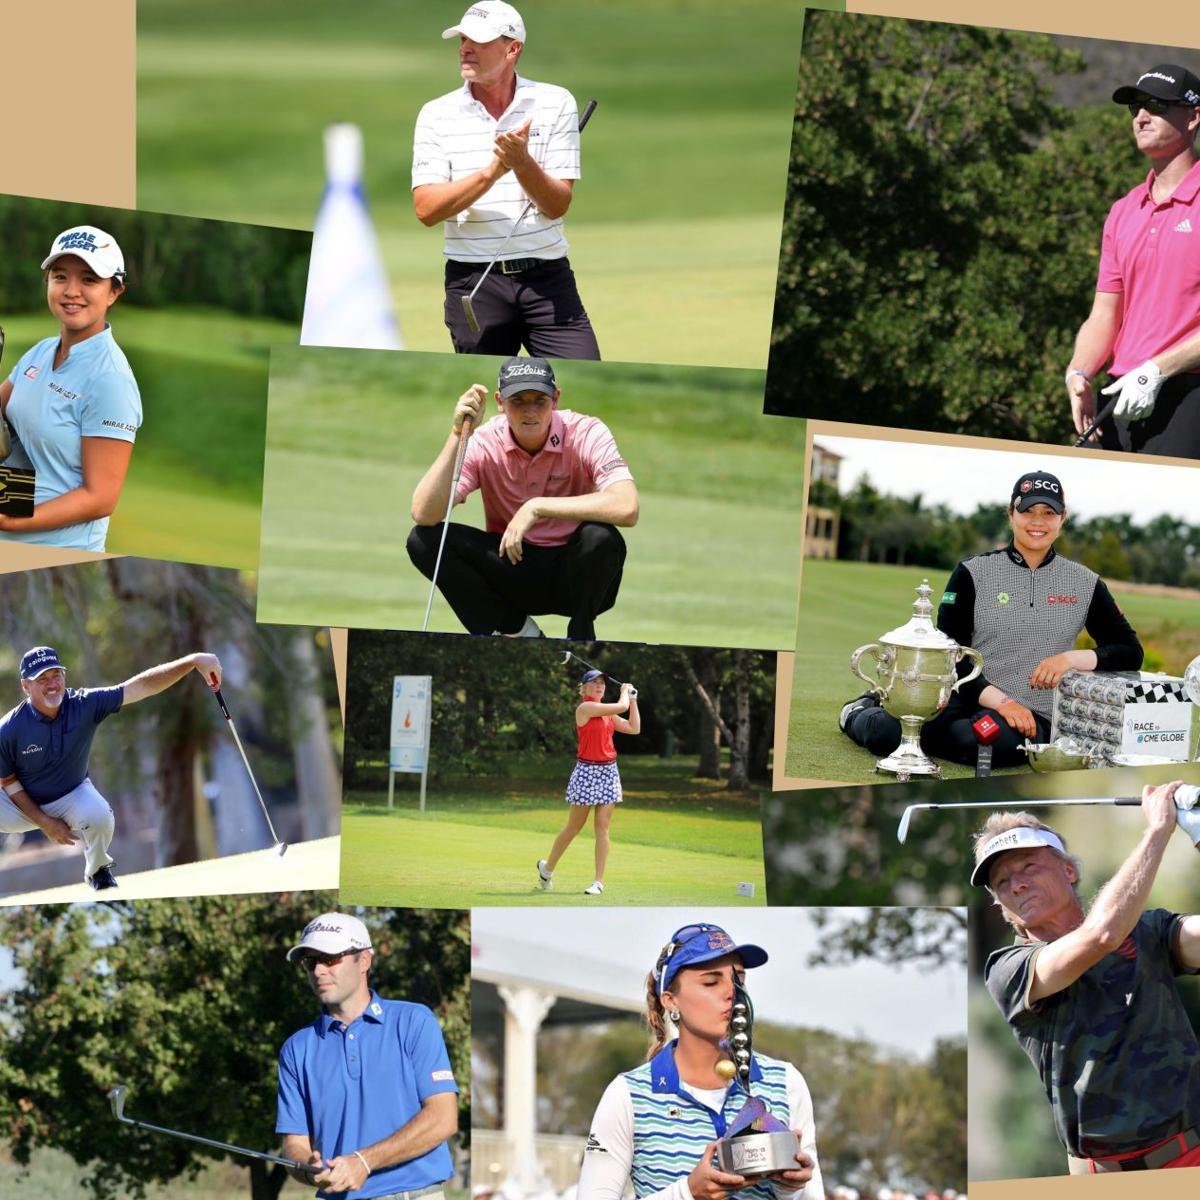 Gary D'Amato: '10 Things to Watch' on PGA Tour Champions, LPGA, Web.com, mini-tours in 2019